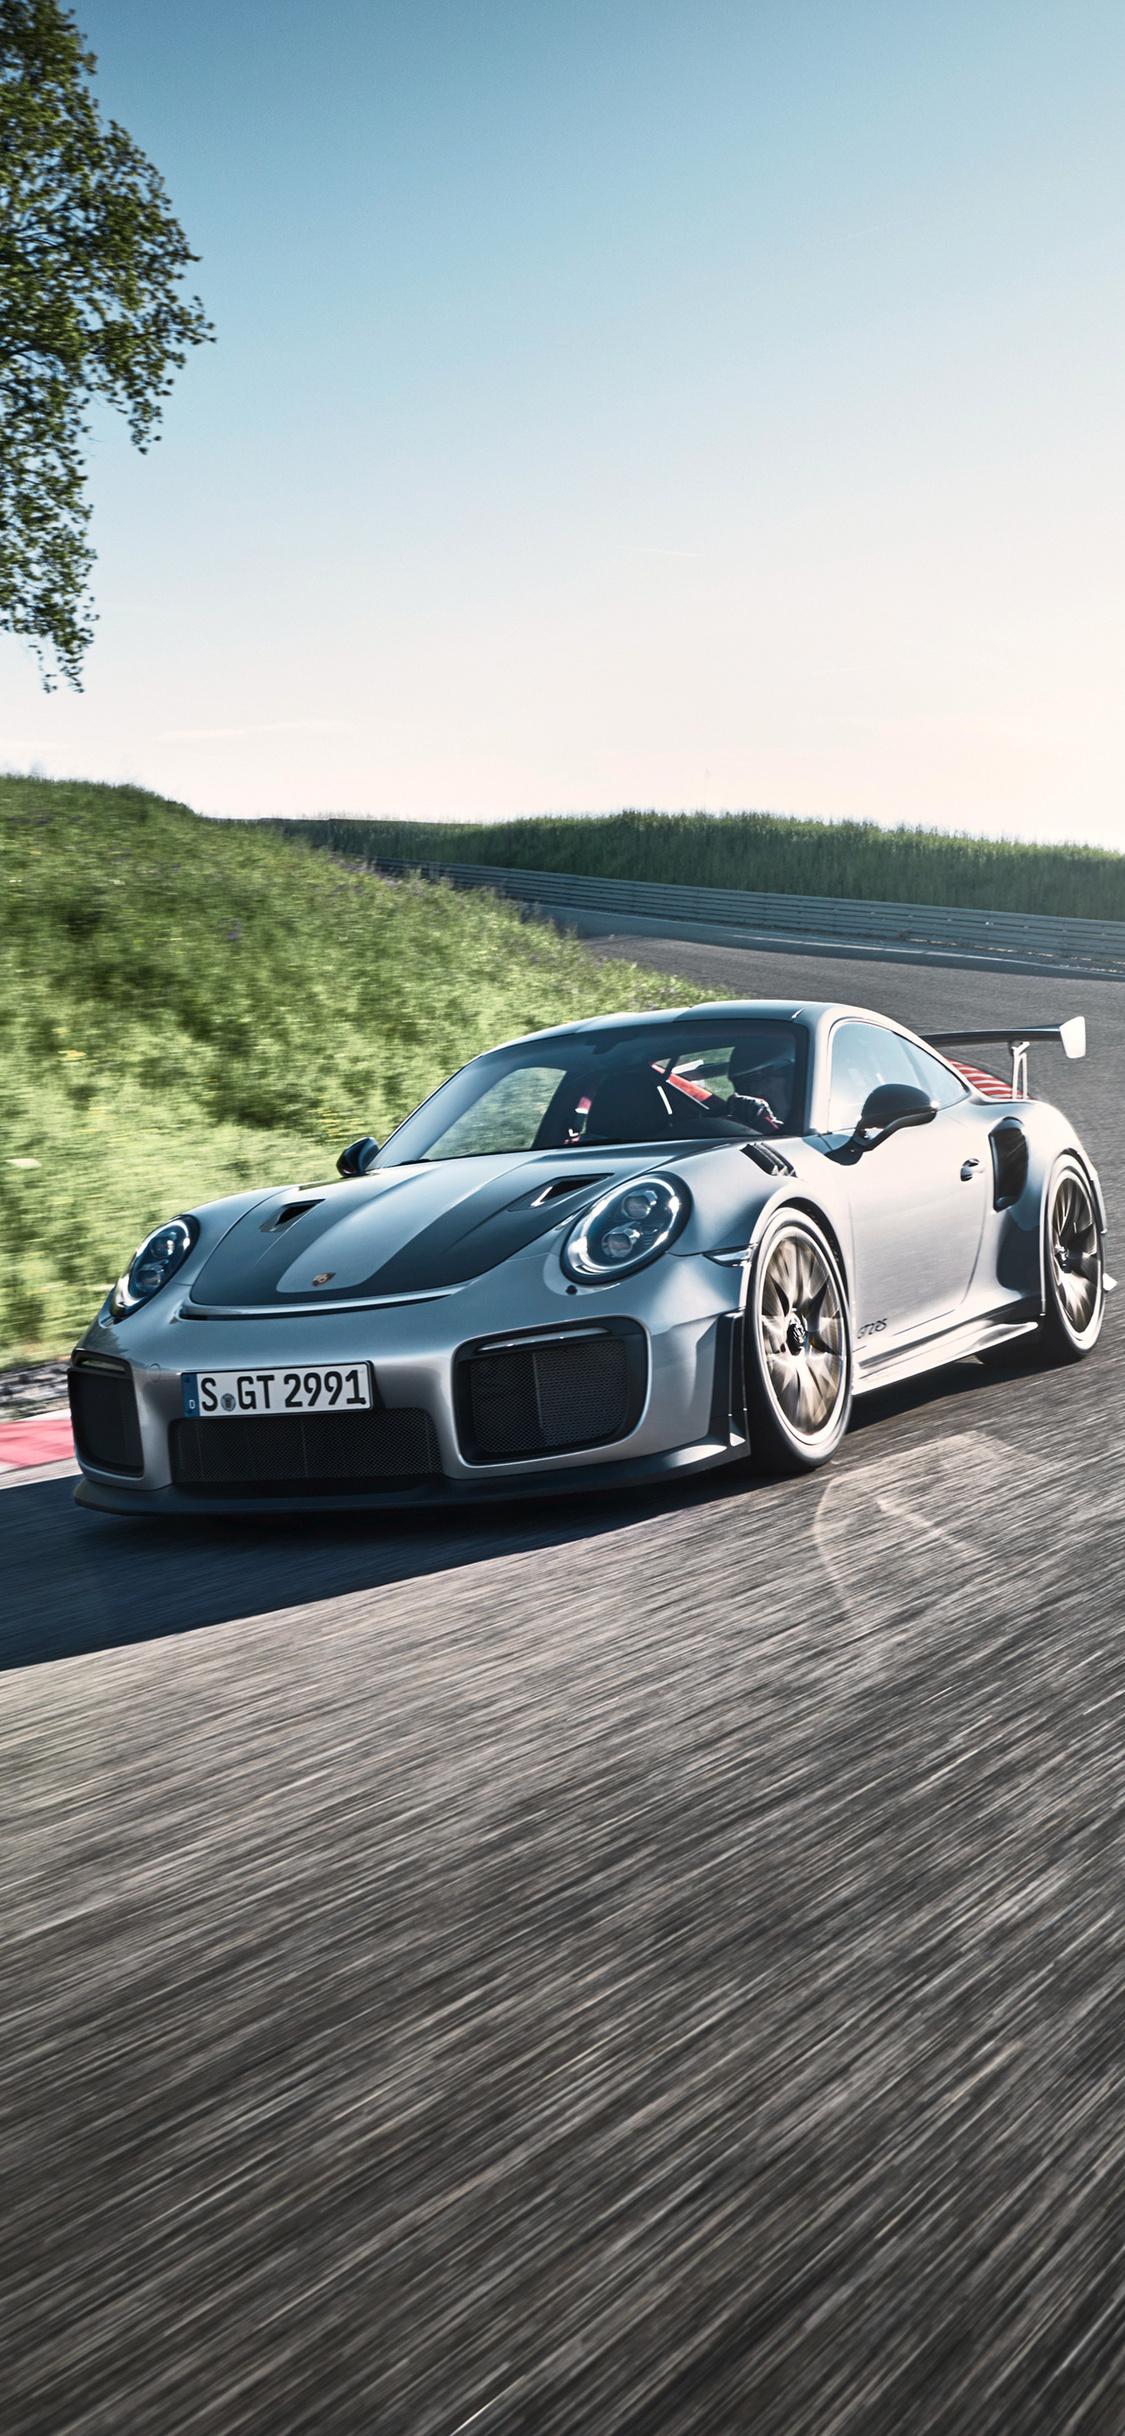 1125x2436 2018 Porsche 911 Gt2 Rs Iphone Xs Iphone 10 Iphone X Hd 4k